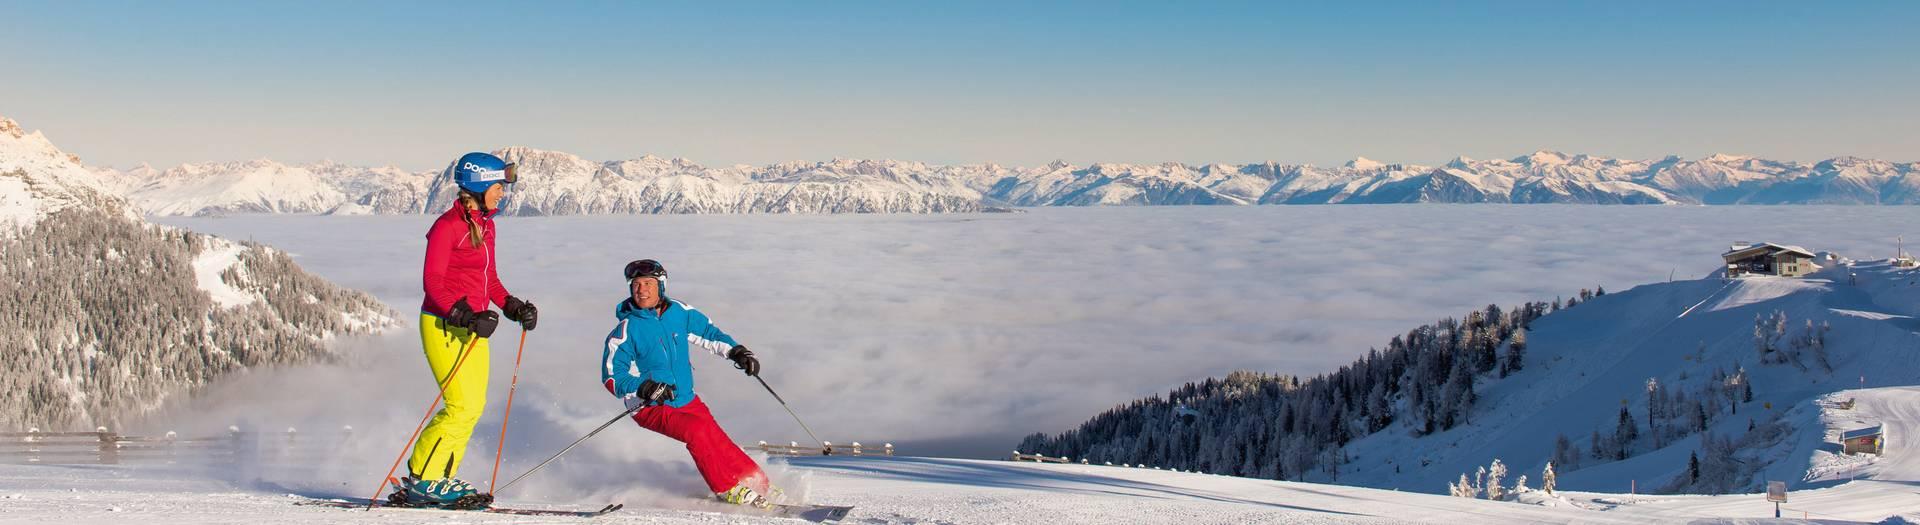 NASSFELD Ski Alpin